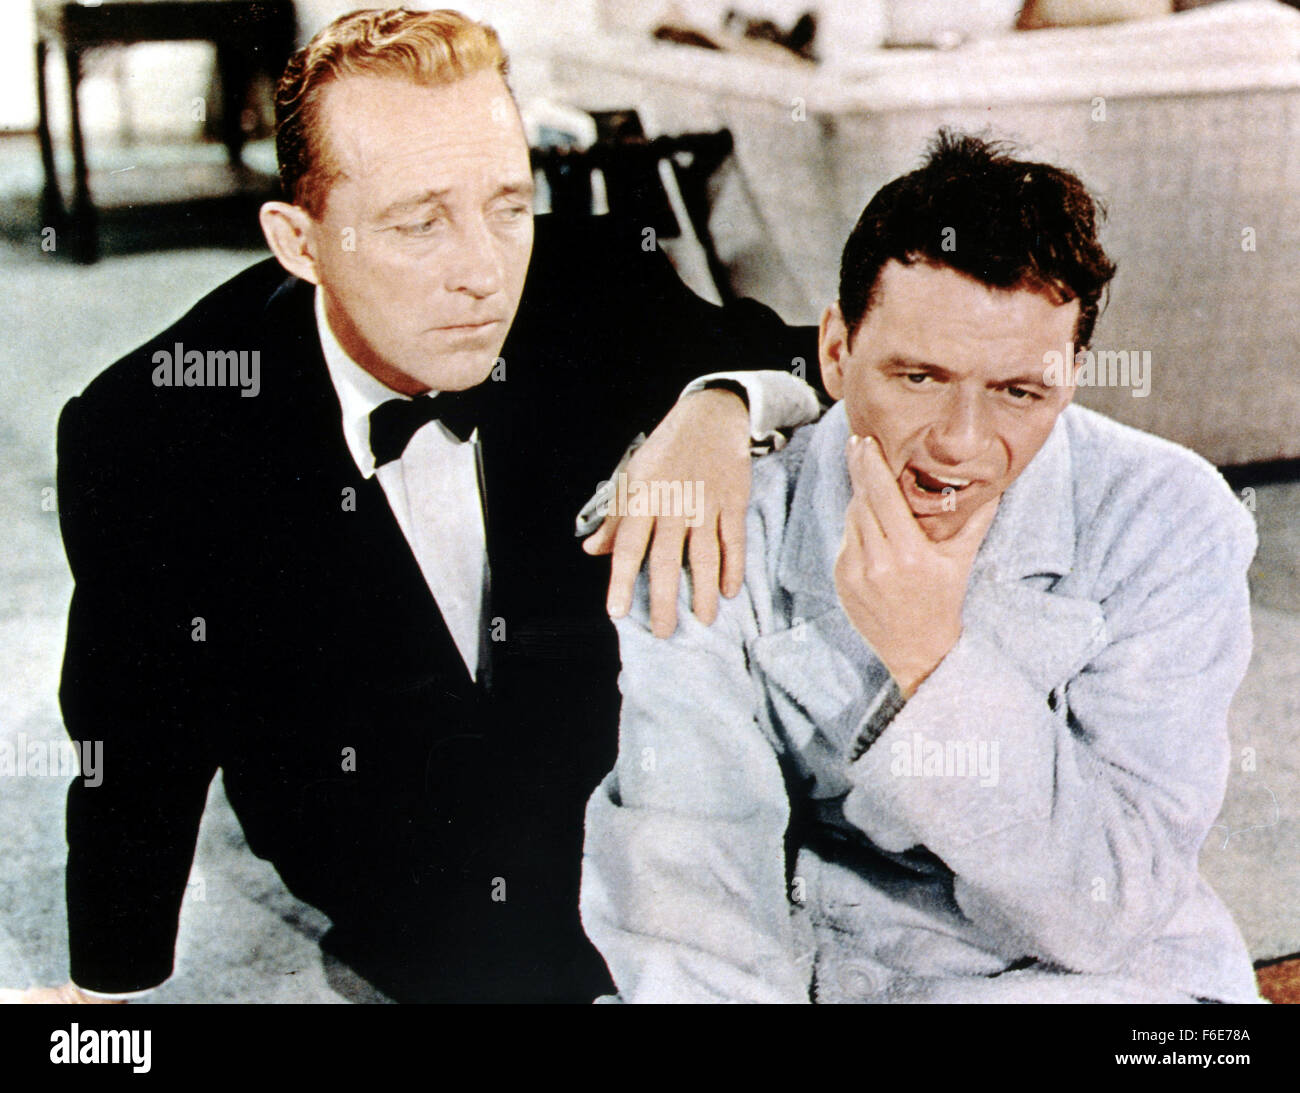 RELEASE DATE: July 17, 1956. MOVIE TITLE: High Society. STUDIO: Metro-Goldwyn-Mayer (MGM). PLOT: C.K. Dexter-Haven, - Stock Image